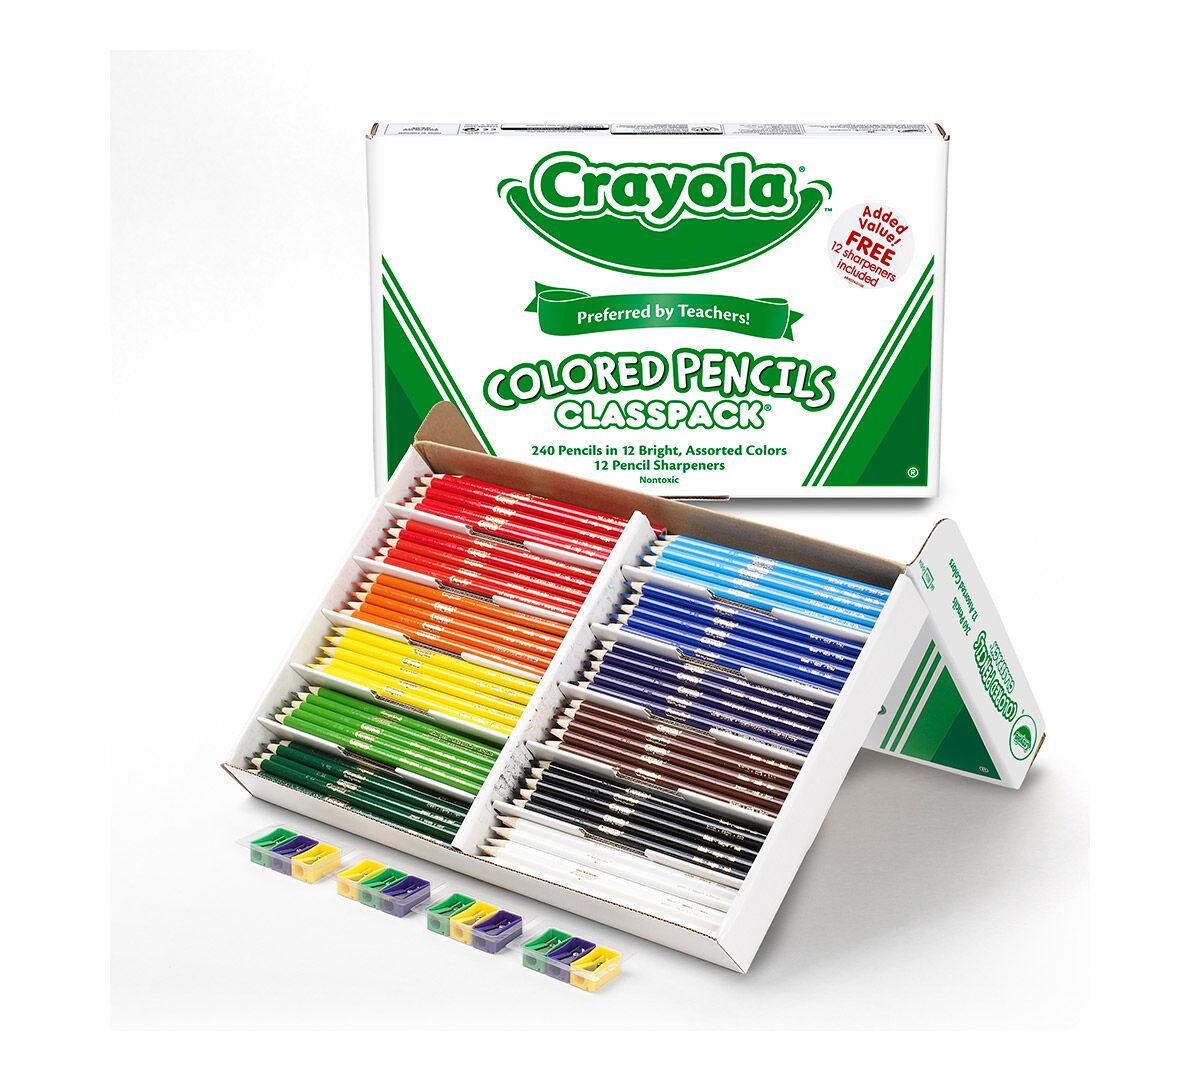 240 Count Colored Pencils Classpack, 12 Colors - Crayola